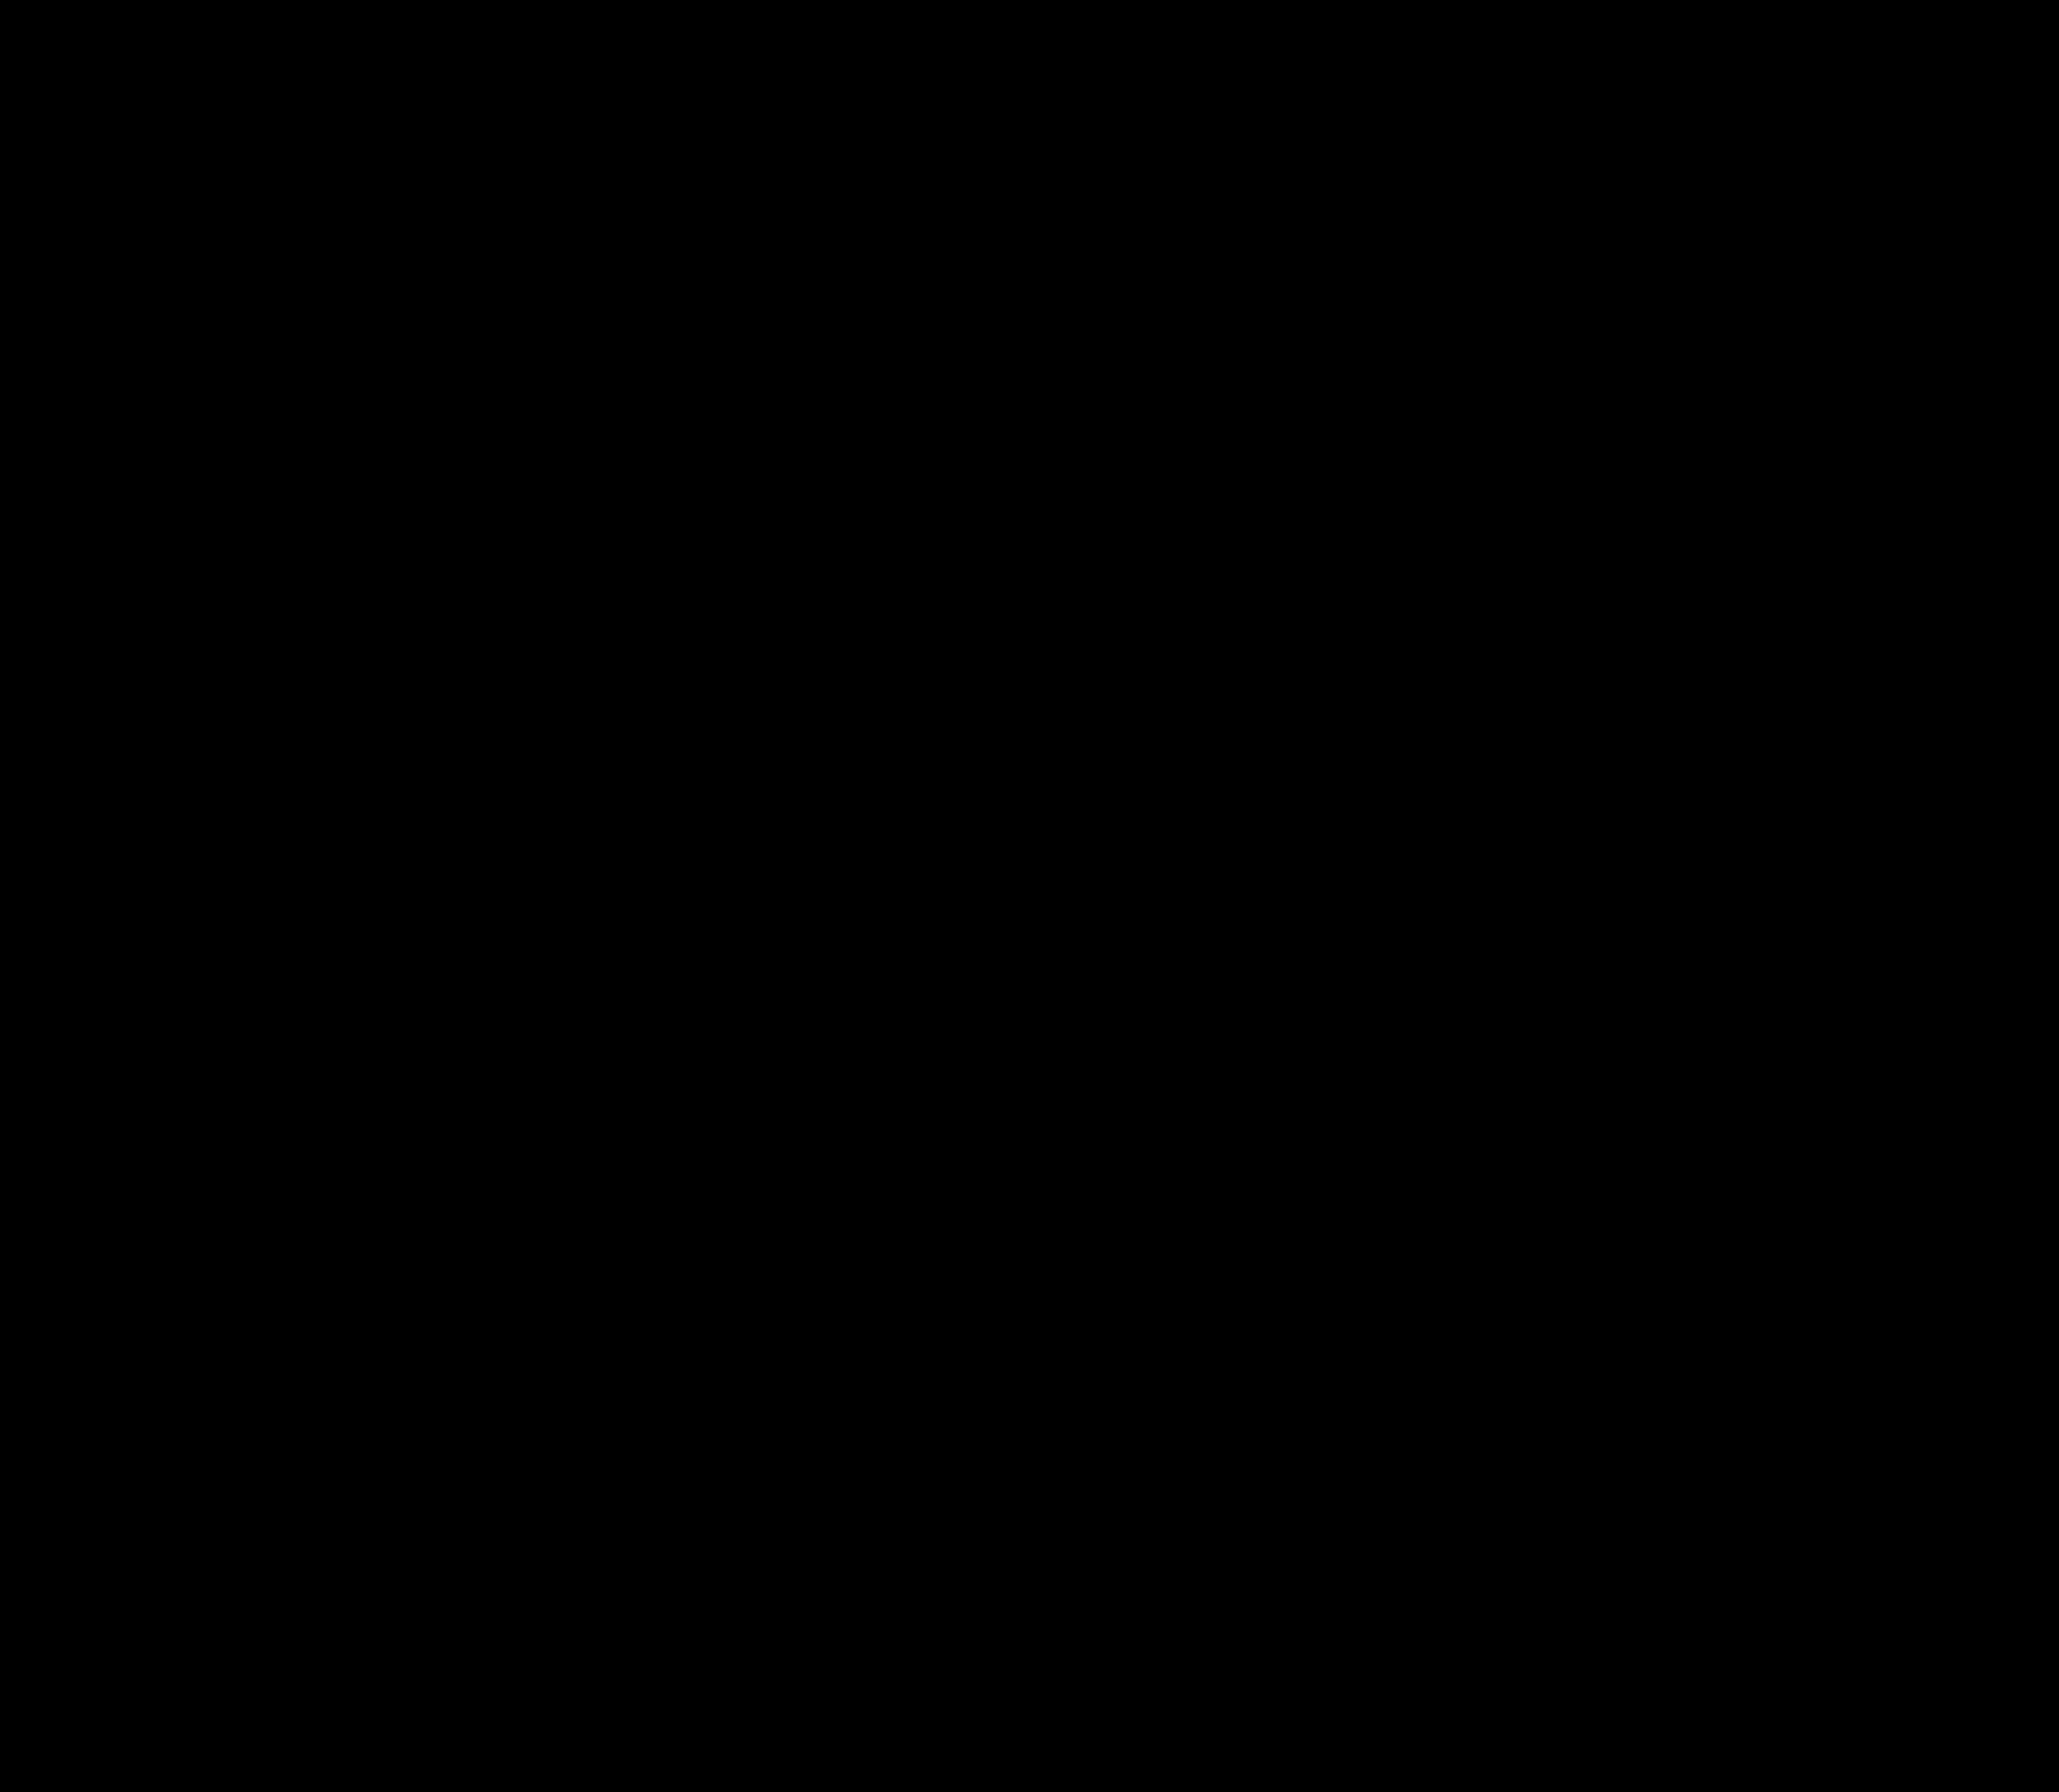 Logo-GatoNegro